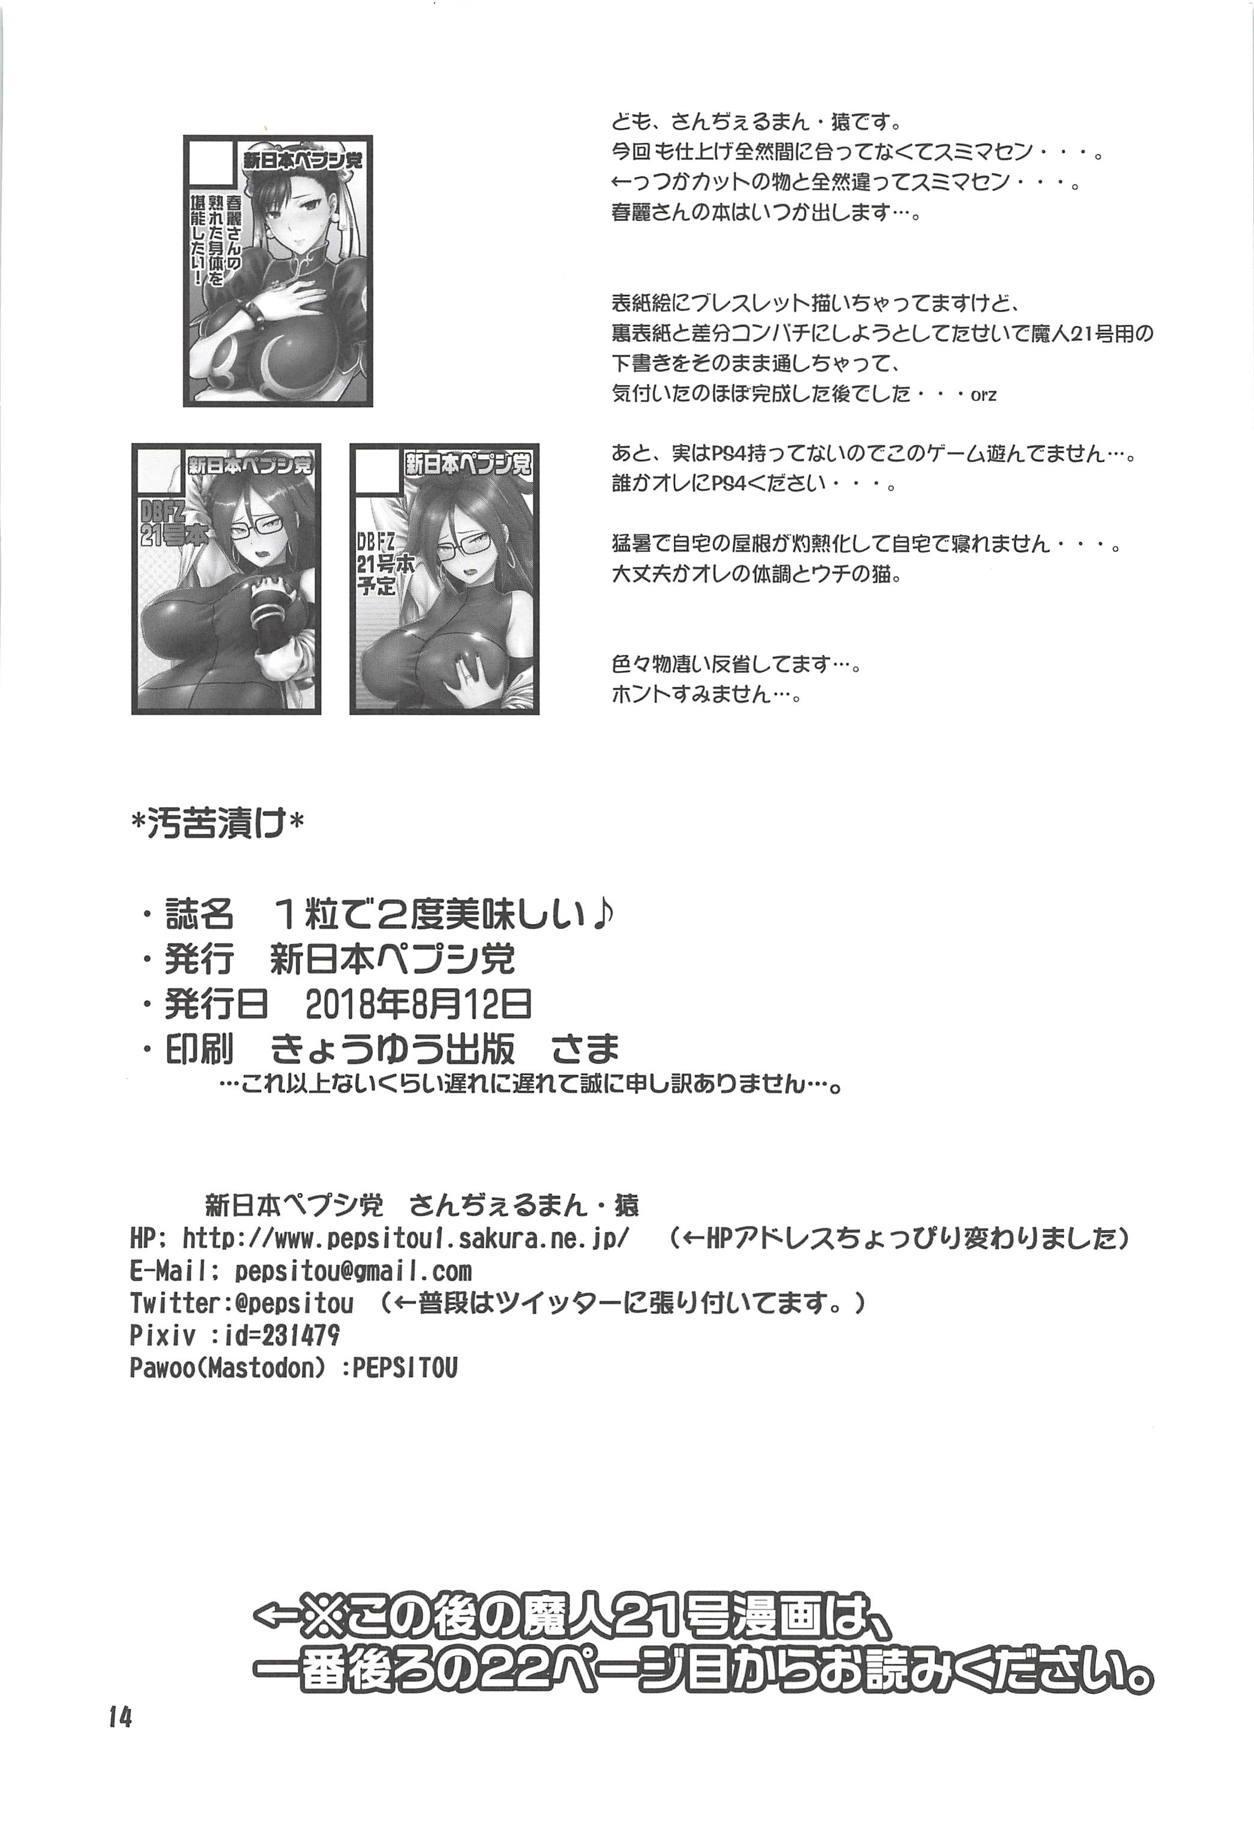 (C94) [Shinnihon Pepsitou (St.germain-sal)] 1-tsubu de 2-do Oishii (Dragon Ball FighterZ) 12